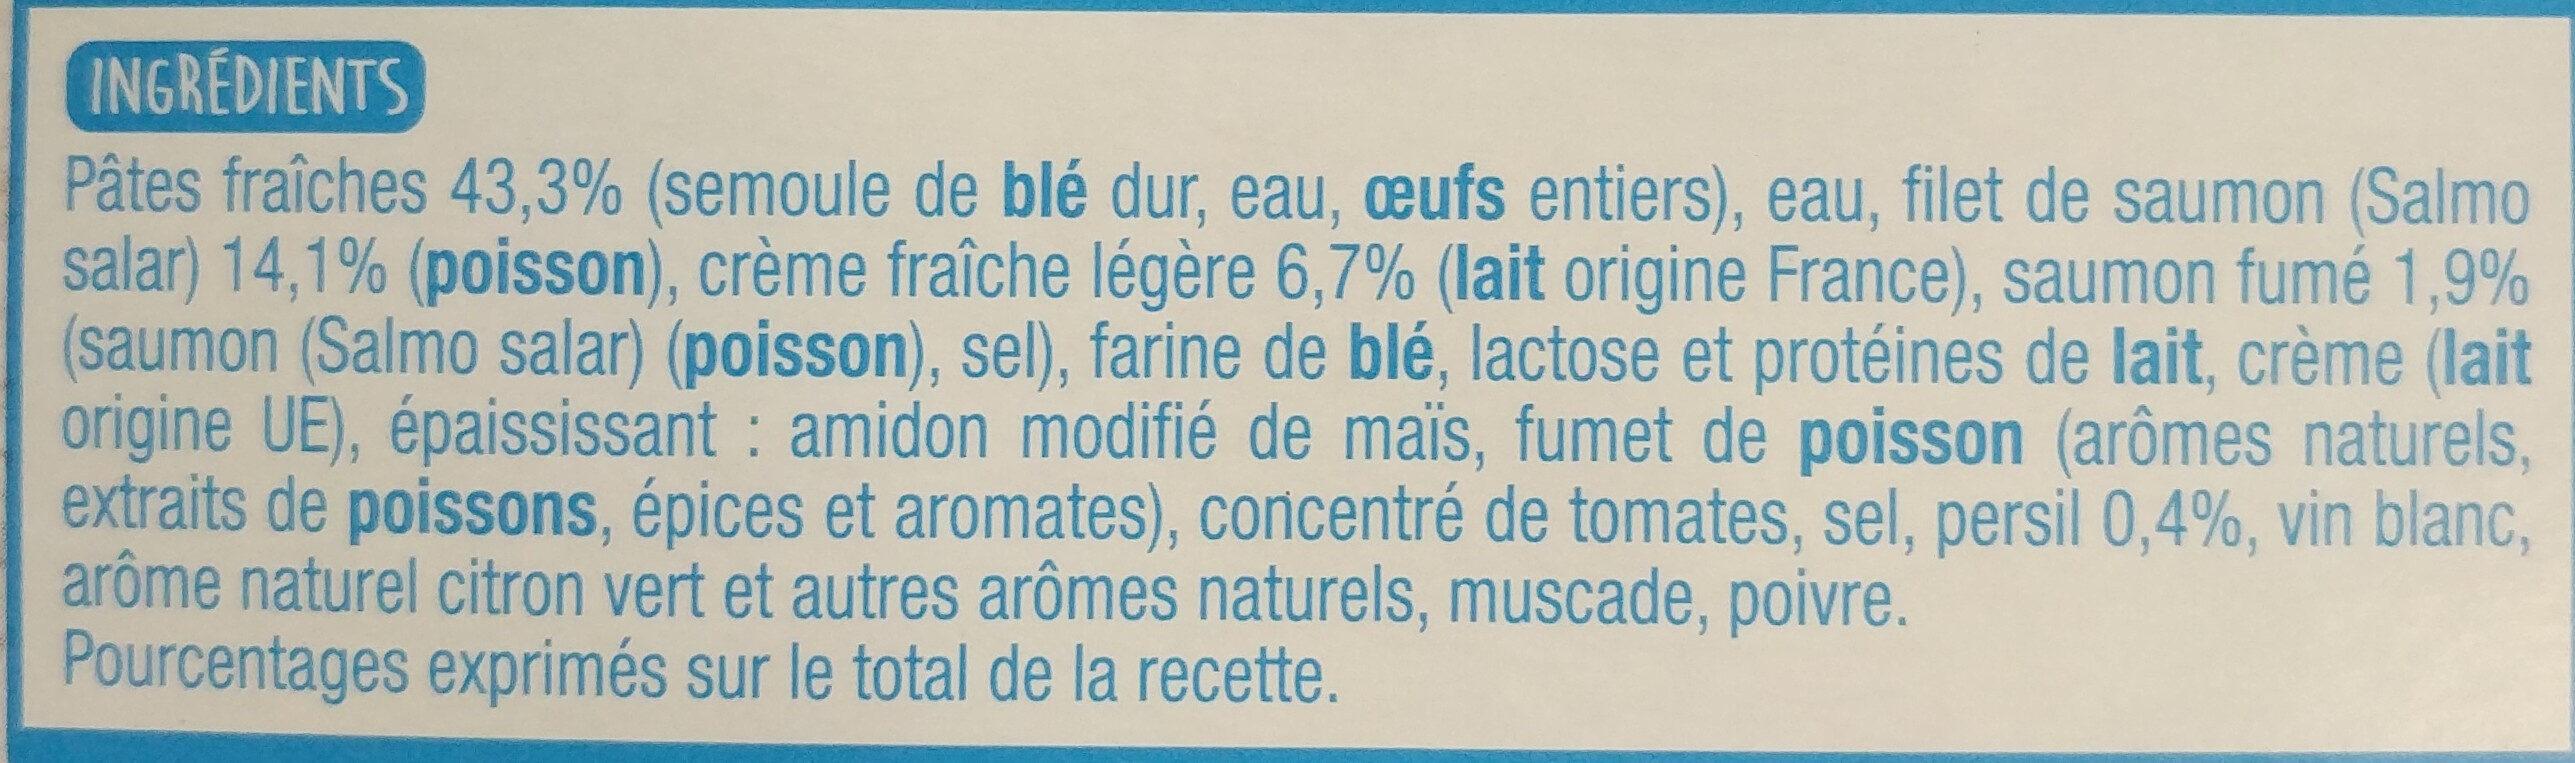 Tagliatelles au Saumon - Ingredients